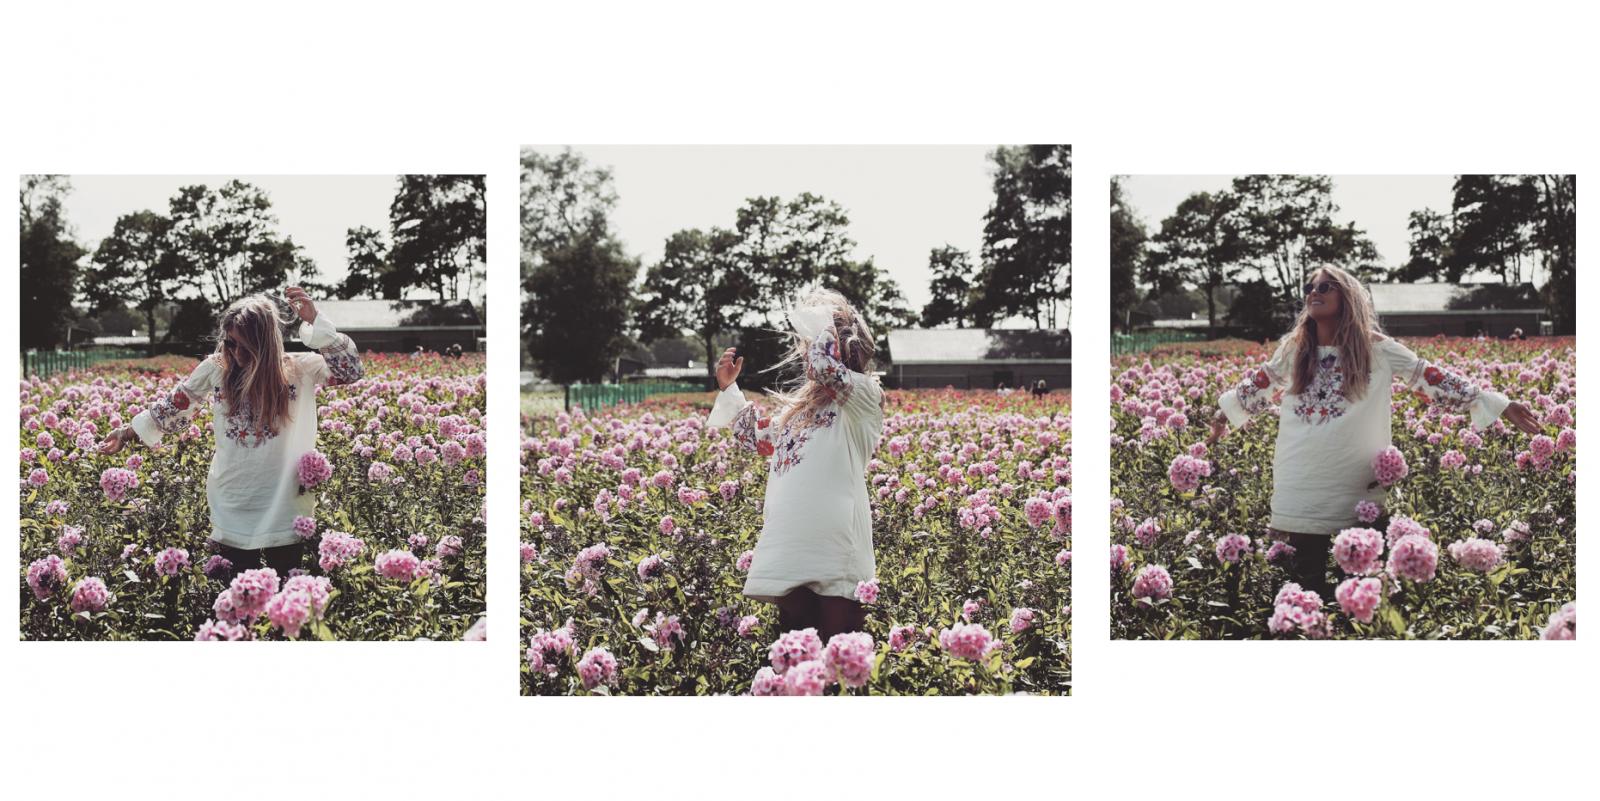 48 Hours In Amsterdam - Flower Fields Fashion - Fashion Blogger